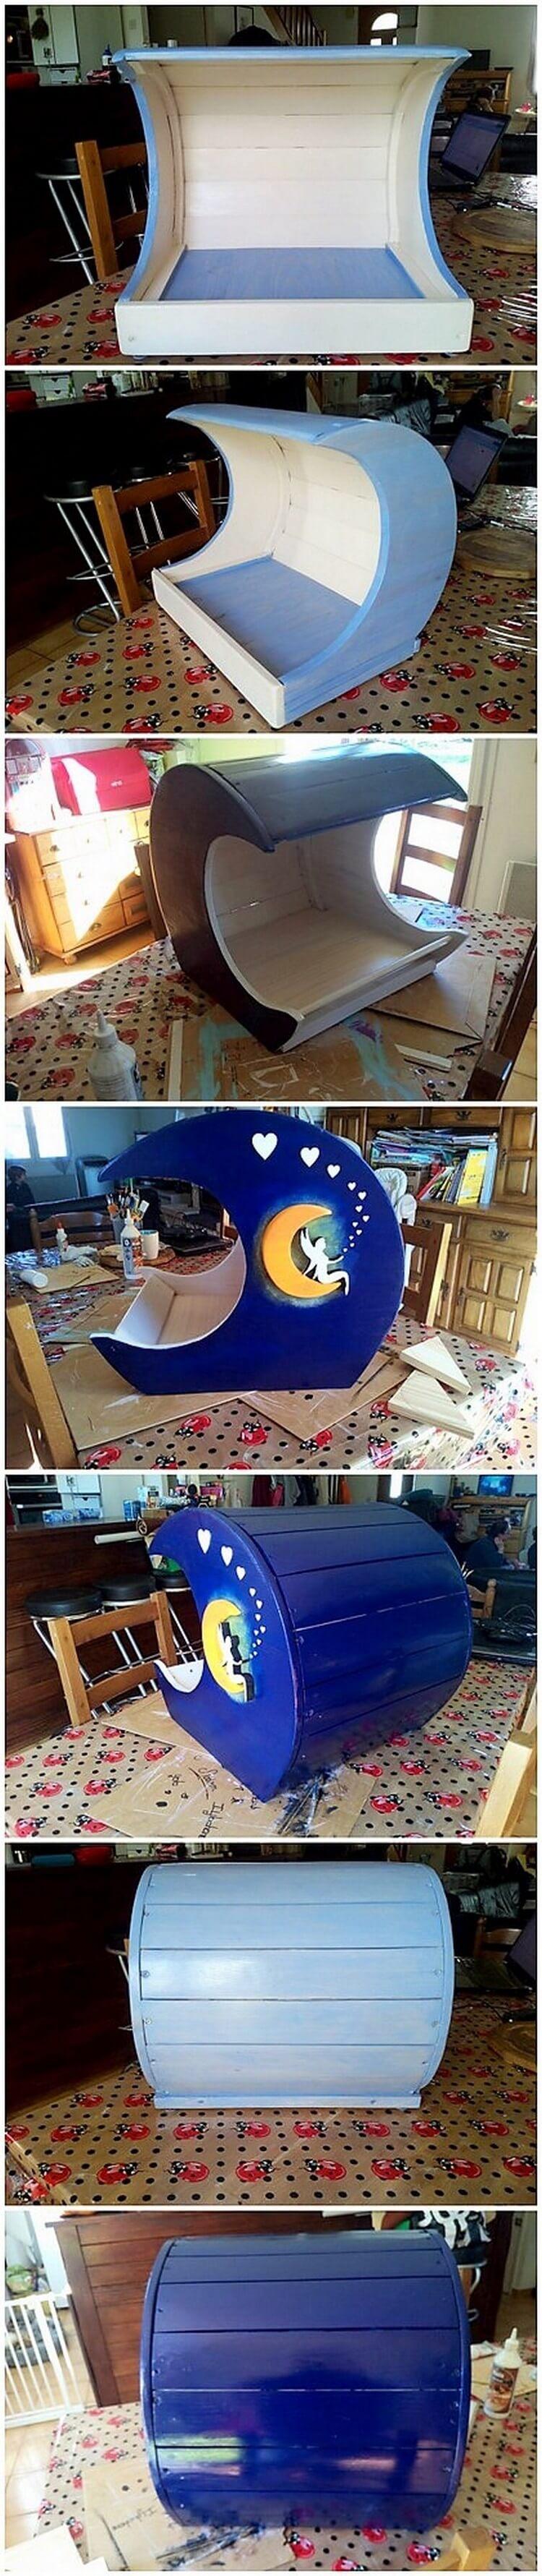 Pallet Half Moon Cradle